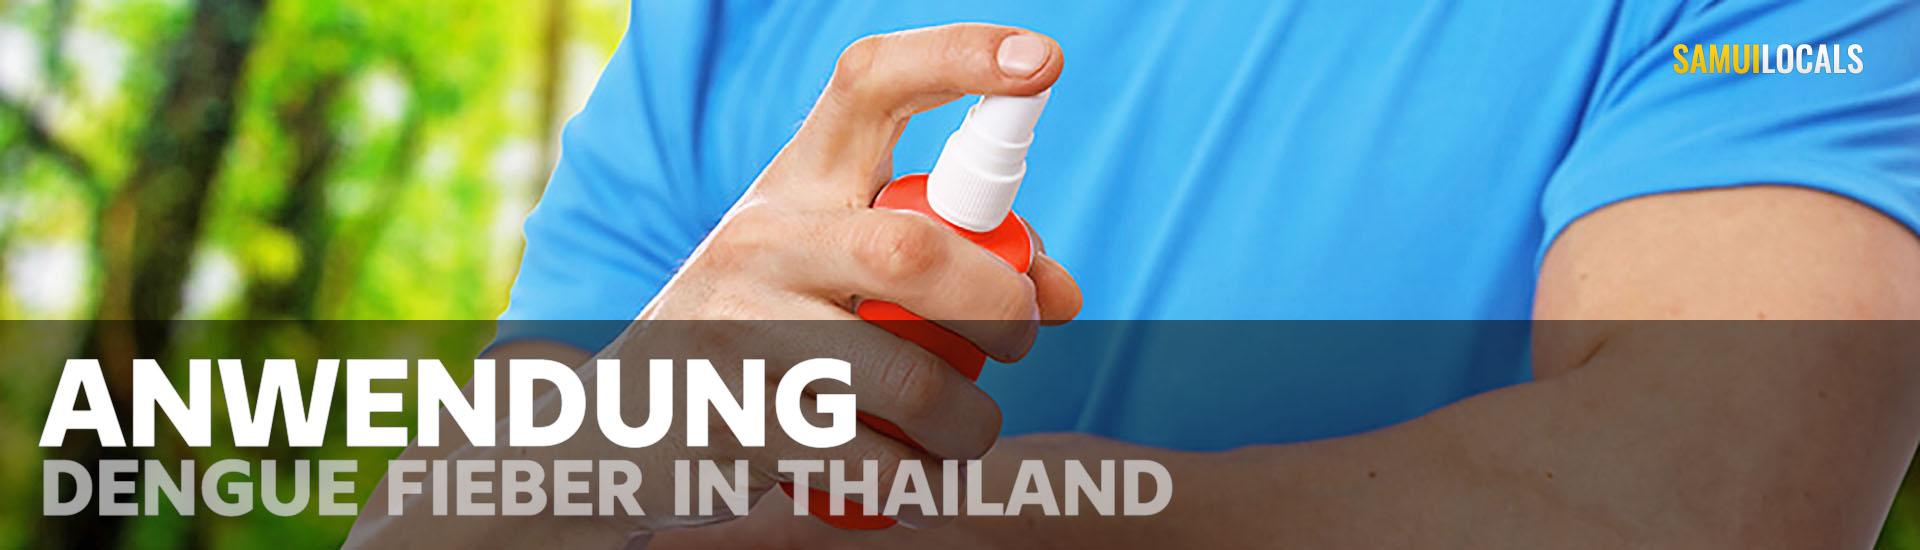 dengue_fieber_thailand_koh_samui